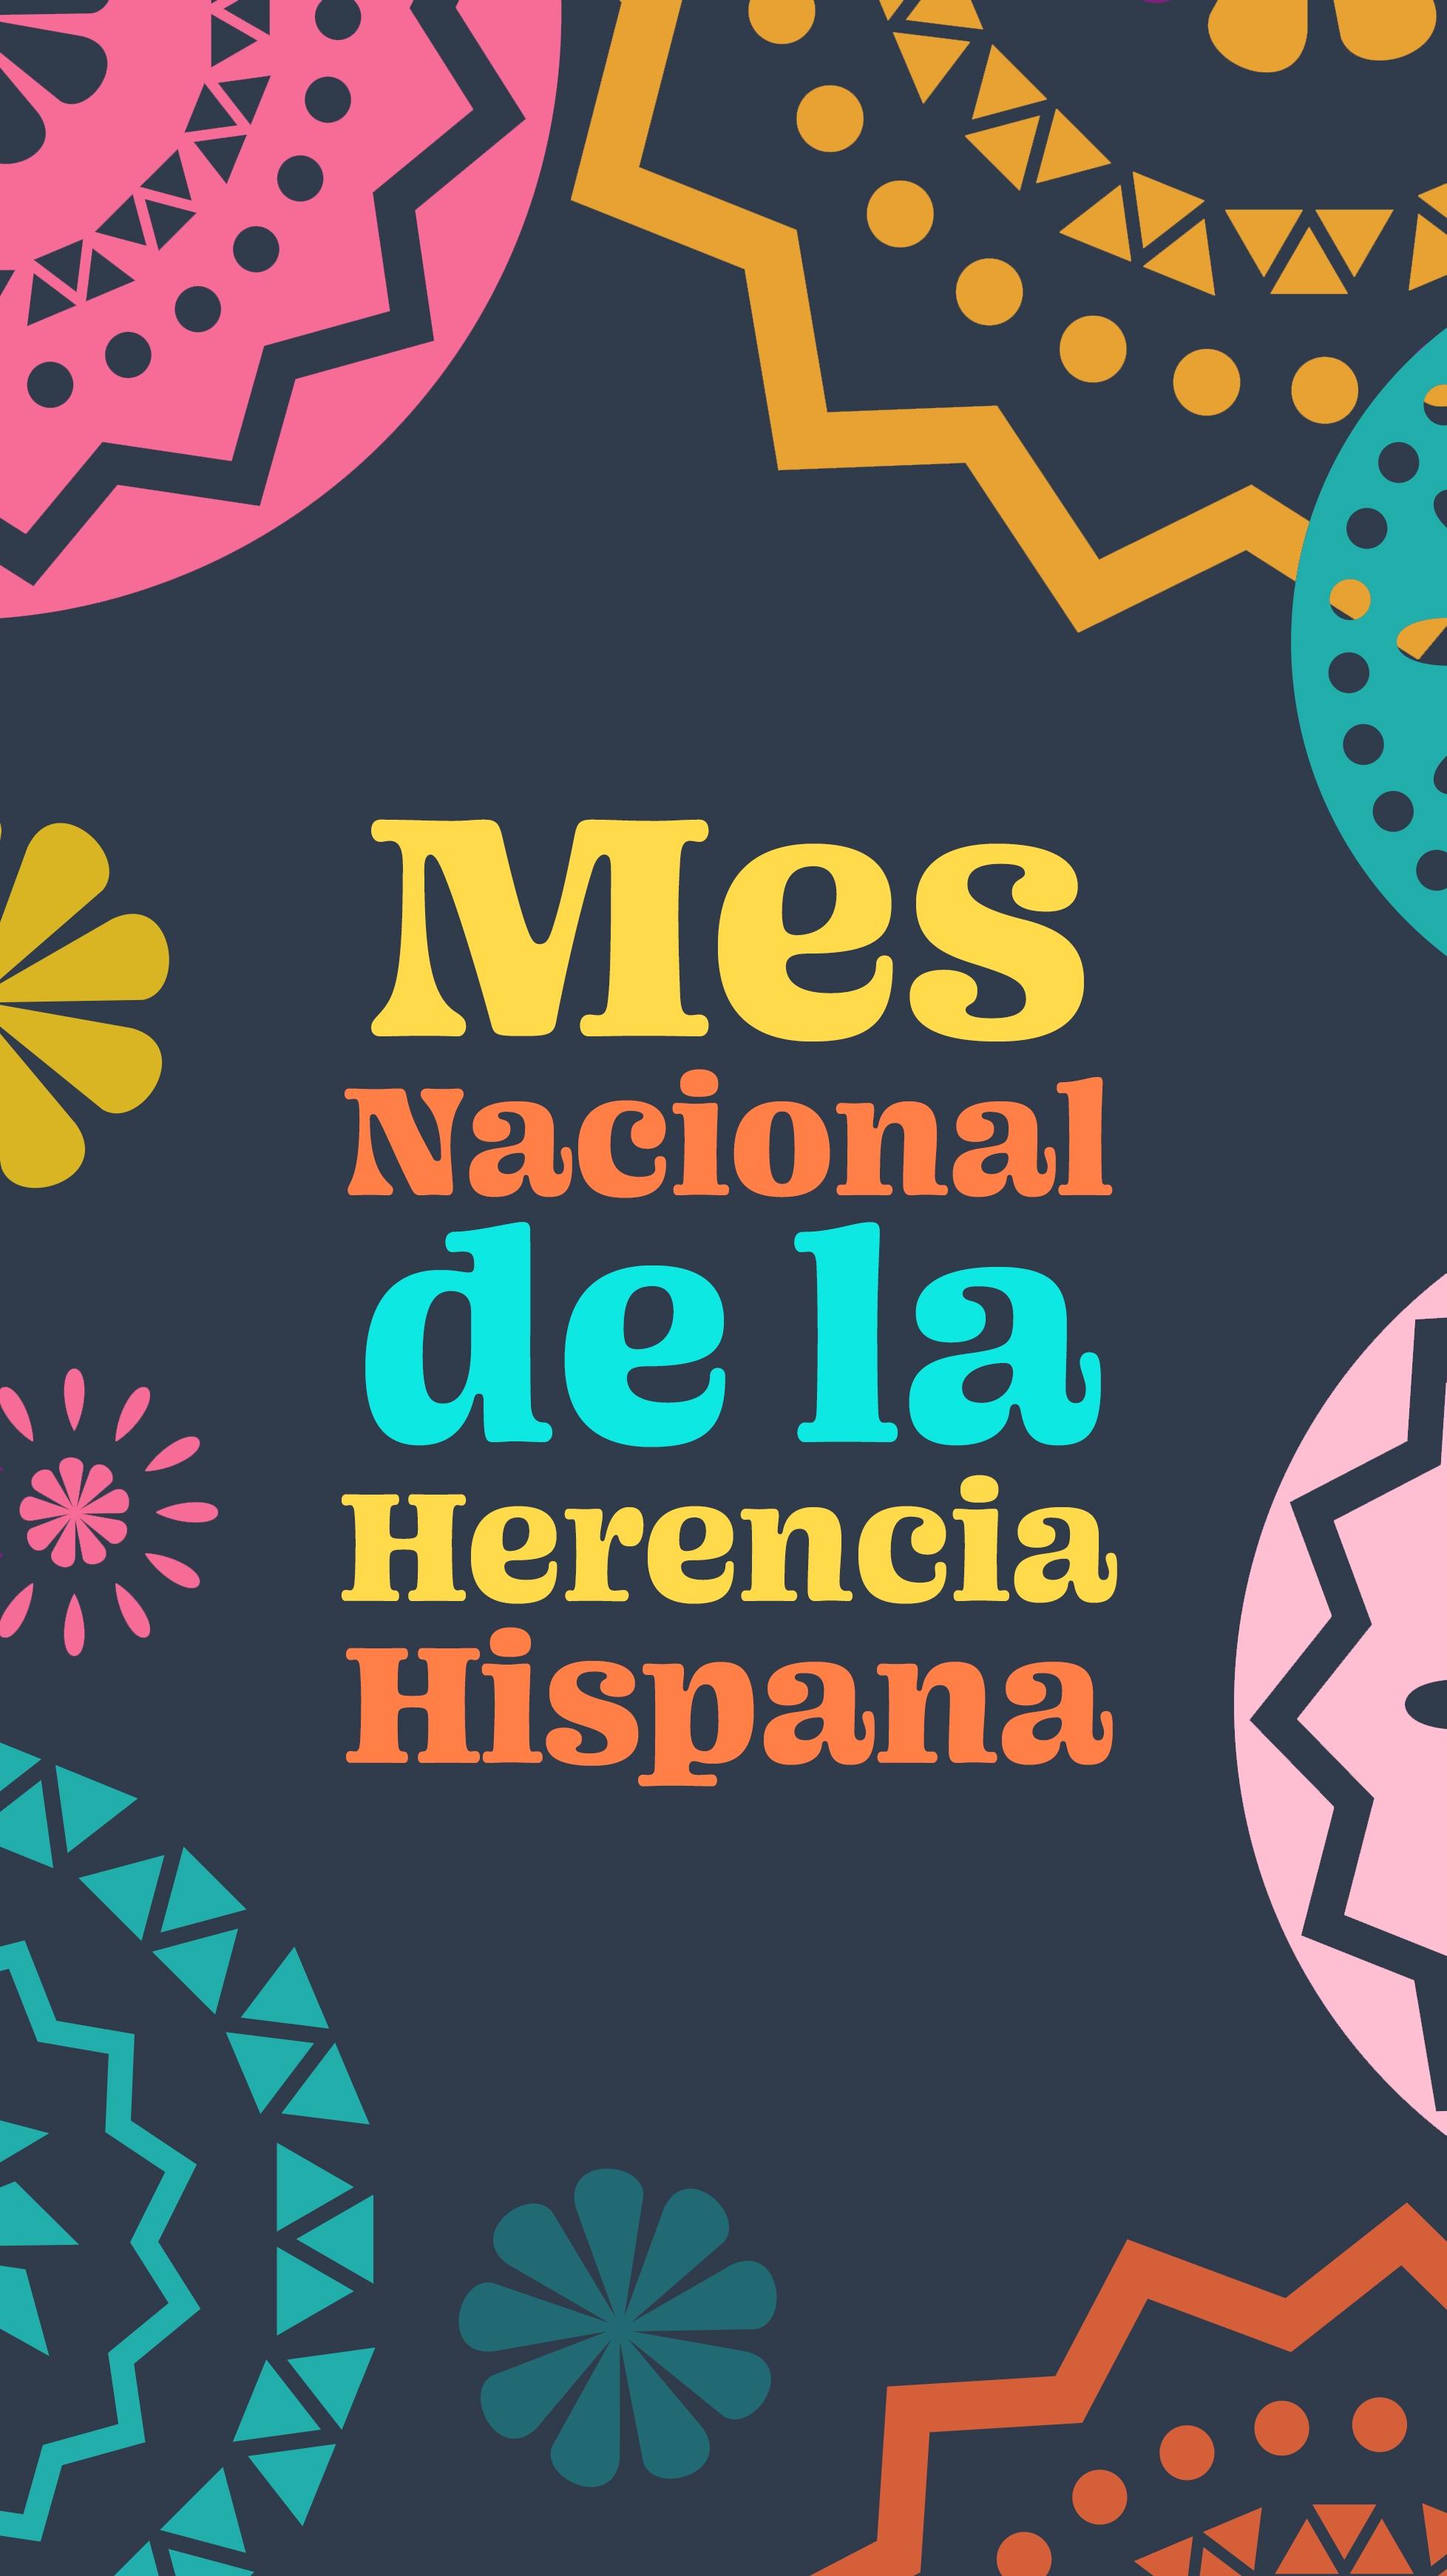 Hispanic Heritage Month 4